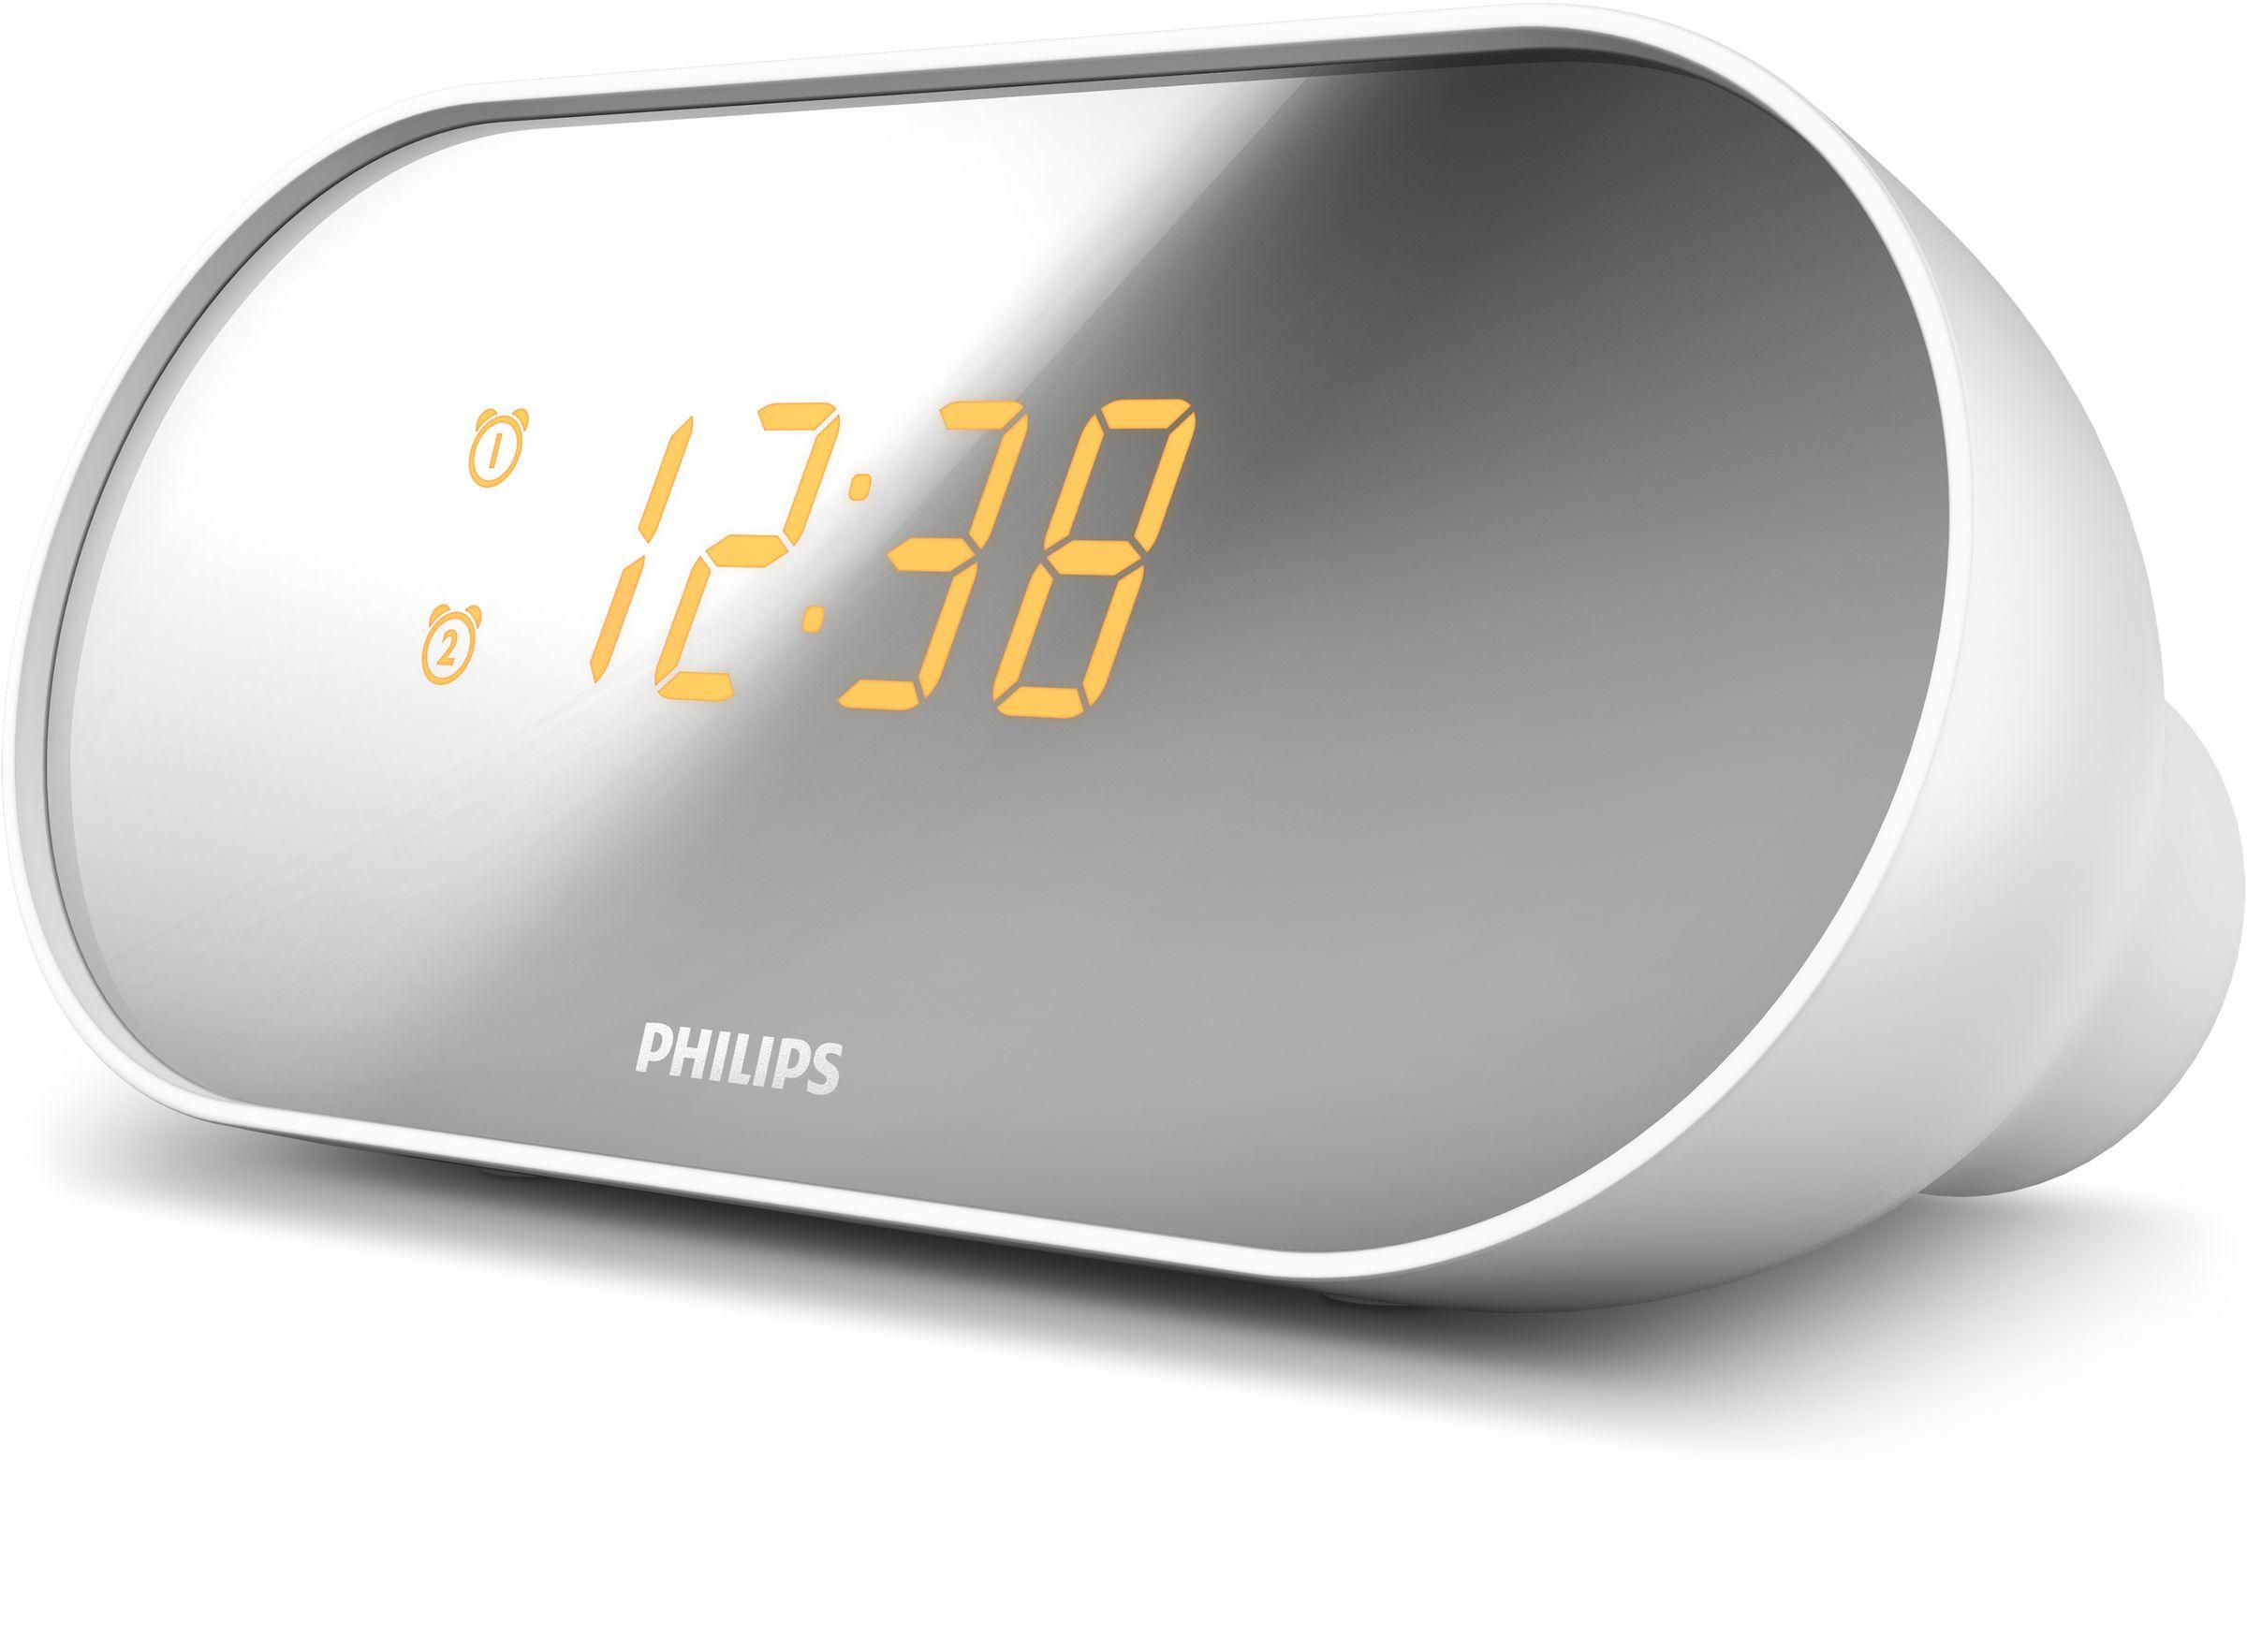 Philips AJ2000/05 Orologio Digitale Specchio, Bianco radio